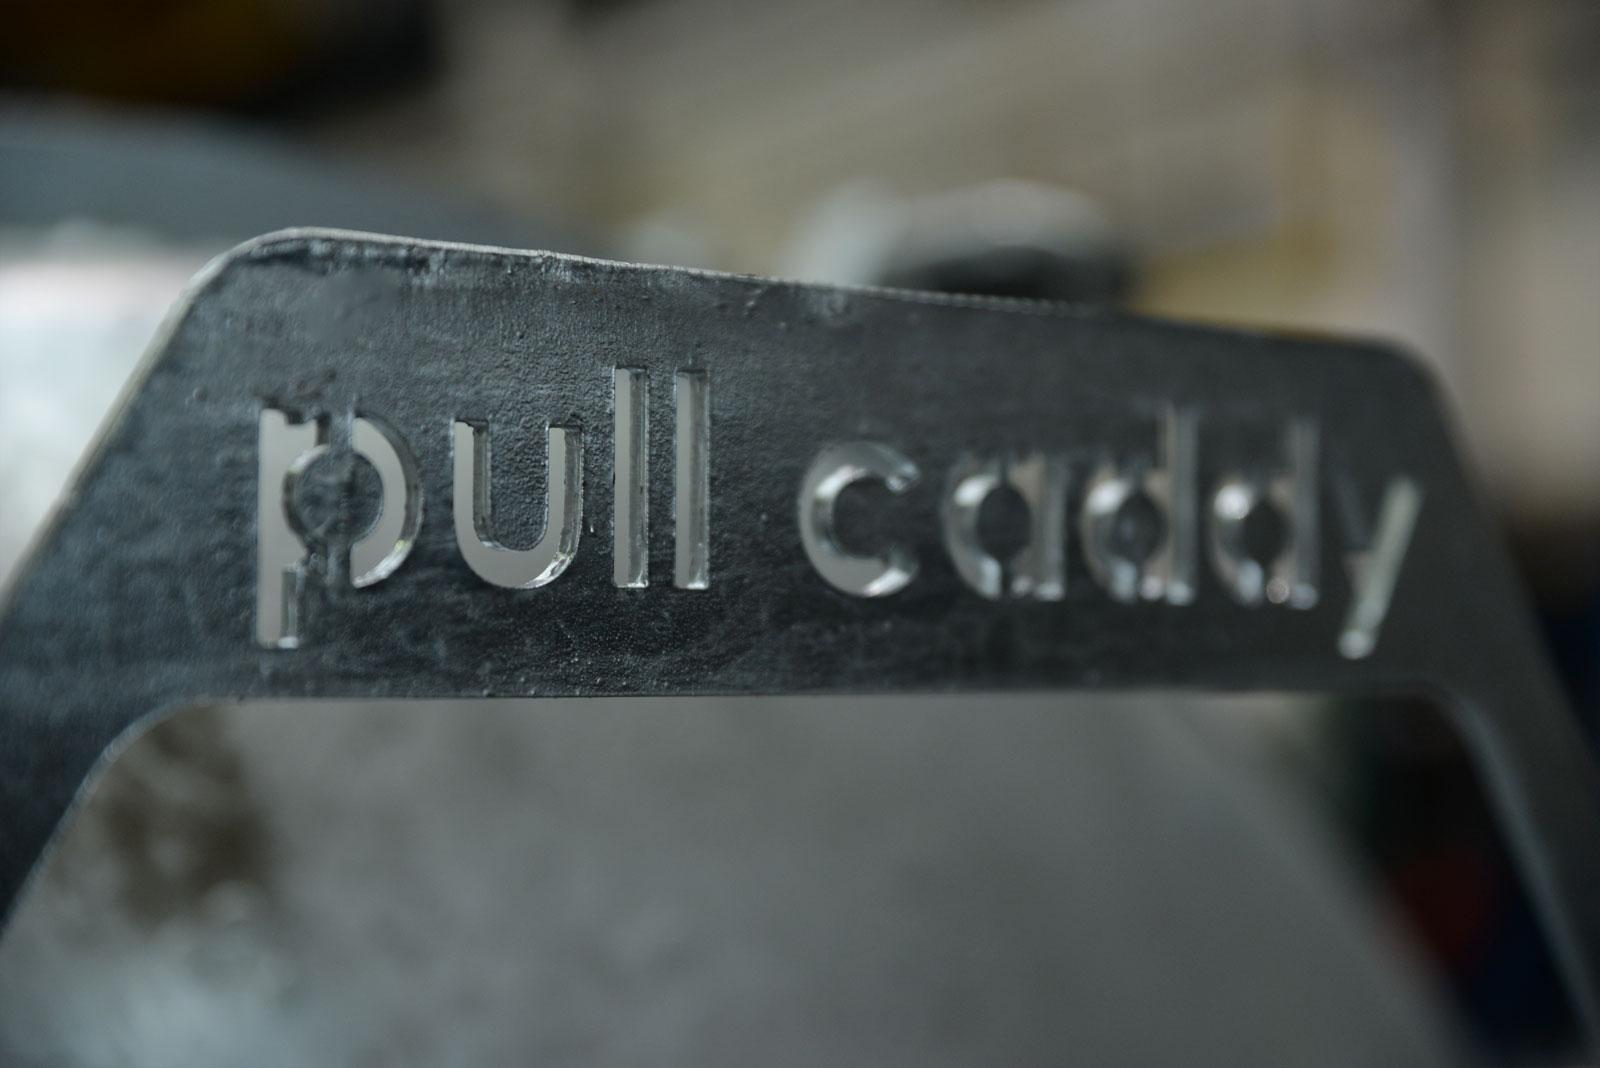 Metallo Pull - Saugfass Pull Caddy